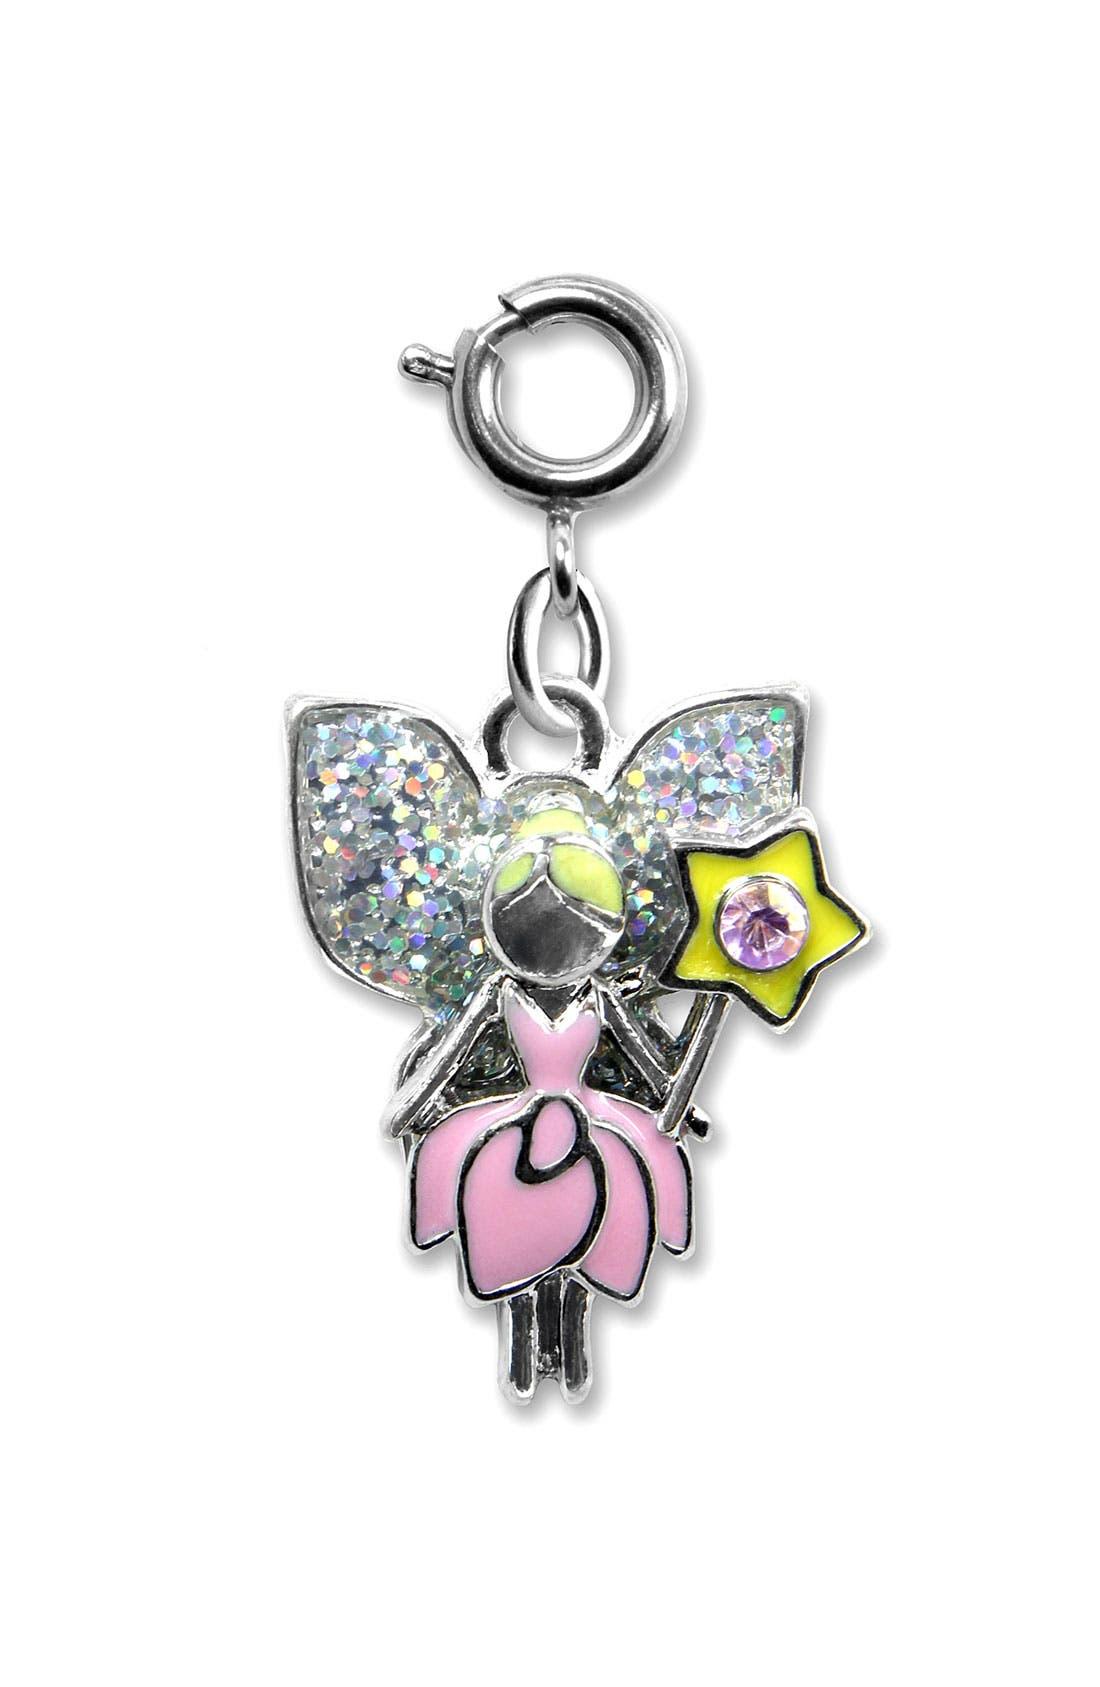 Main Image - CHARM IT!® 'Princess Fairytale' Charm (Girls)